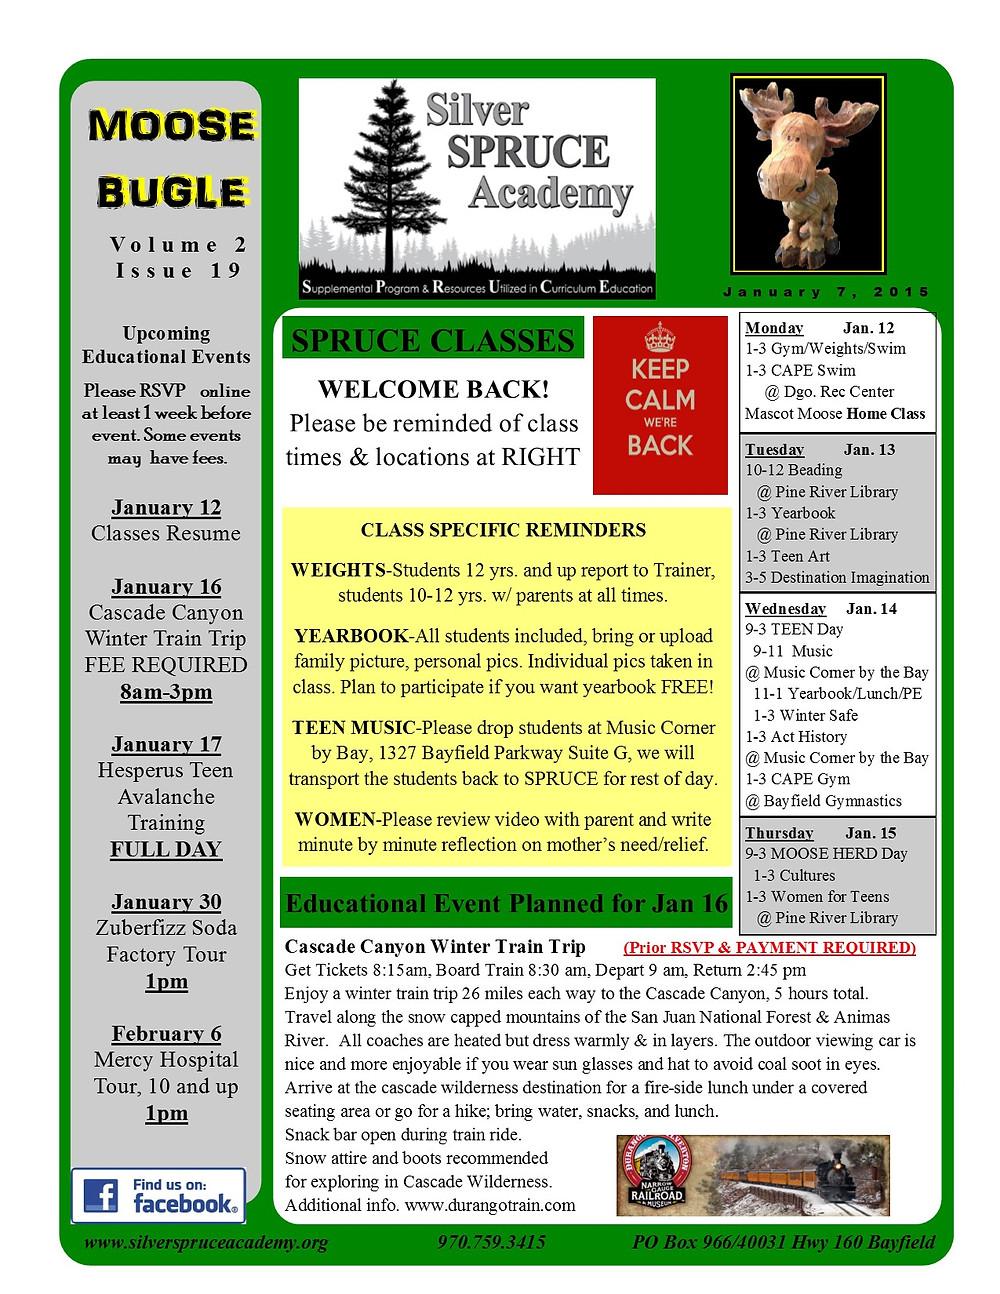 Moose Bugle 1-9-15 (Page 1).jpg